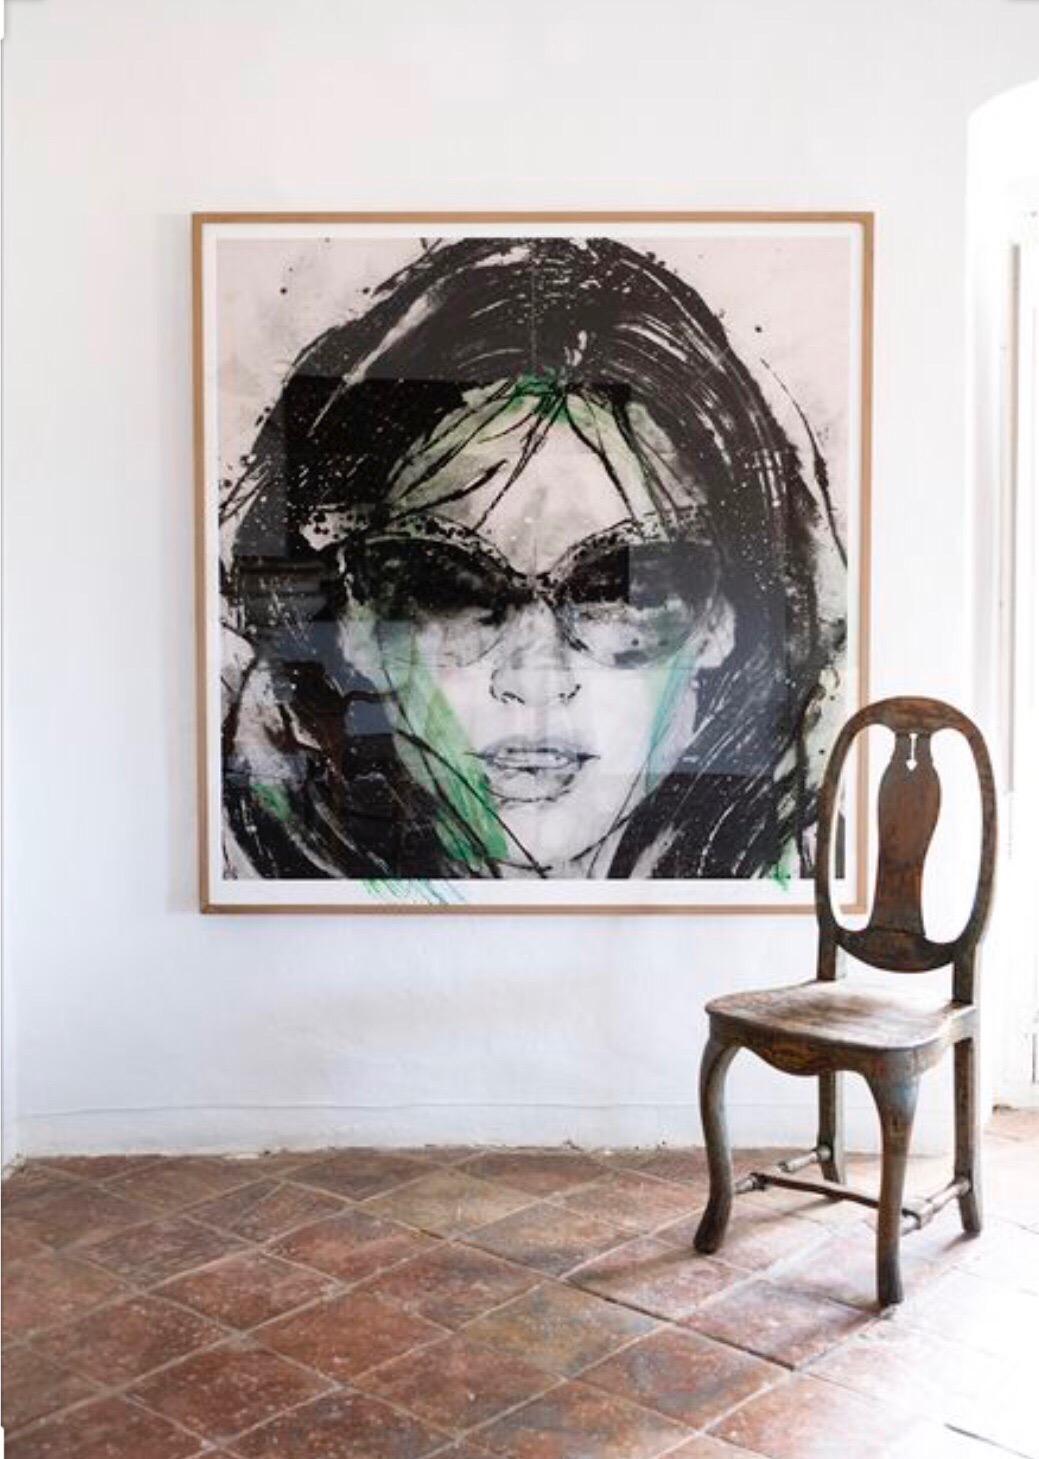 Retratos espectaculares de la artista Lidia Masllorens